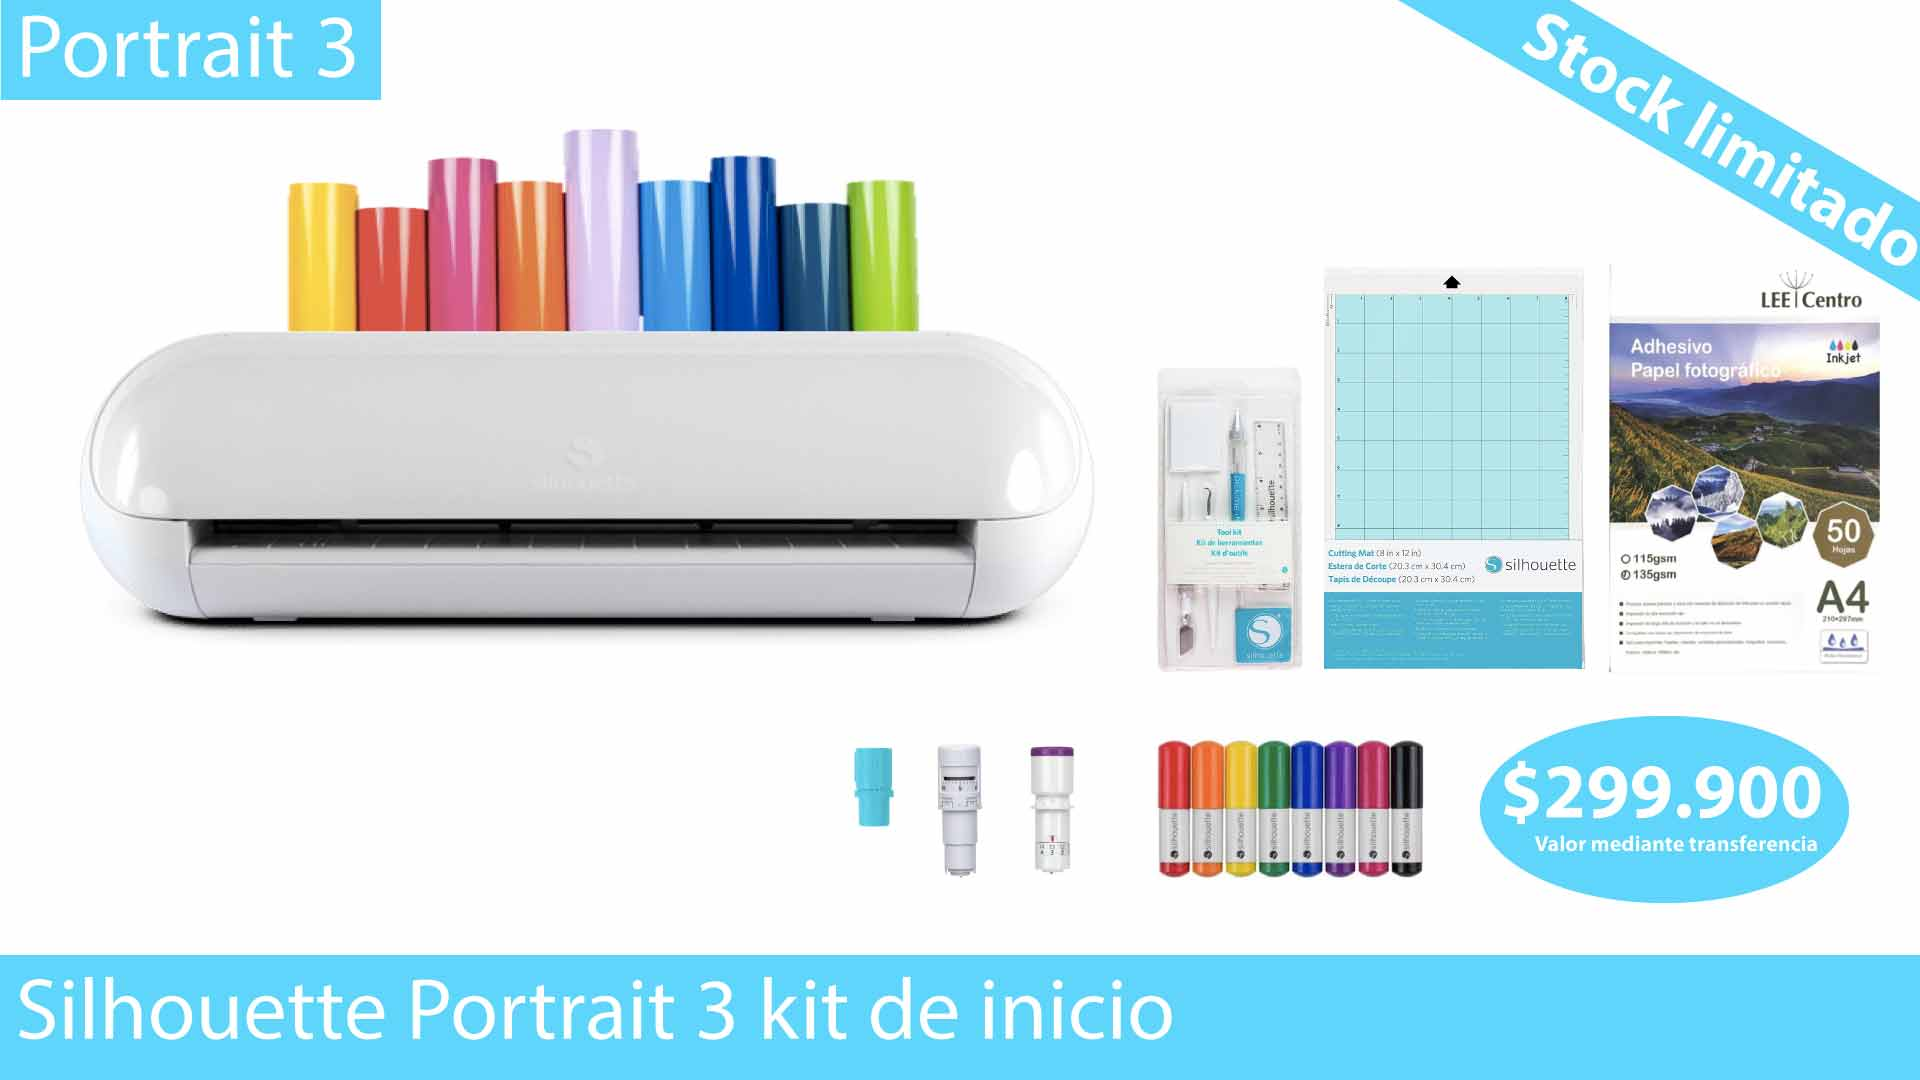 Silhouette portrait 3 kit de inicio oferta